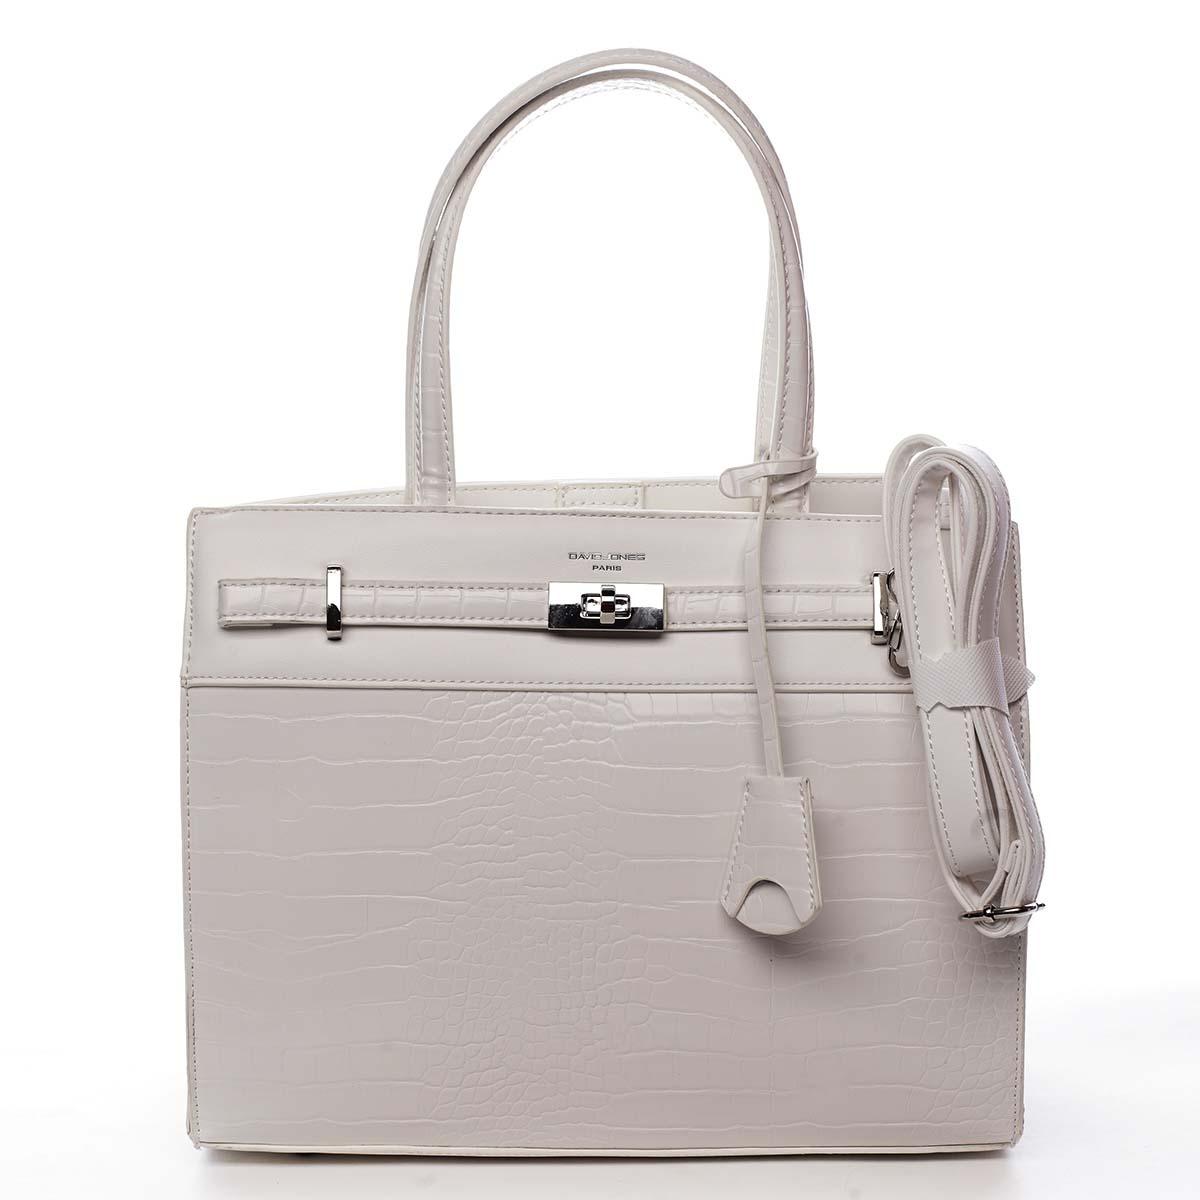 Dámska kabelka cez rameno biela - David Jones Devriese biela